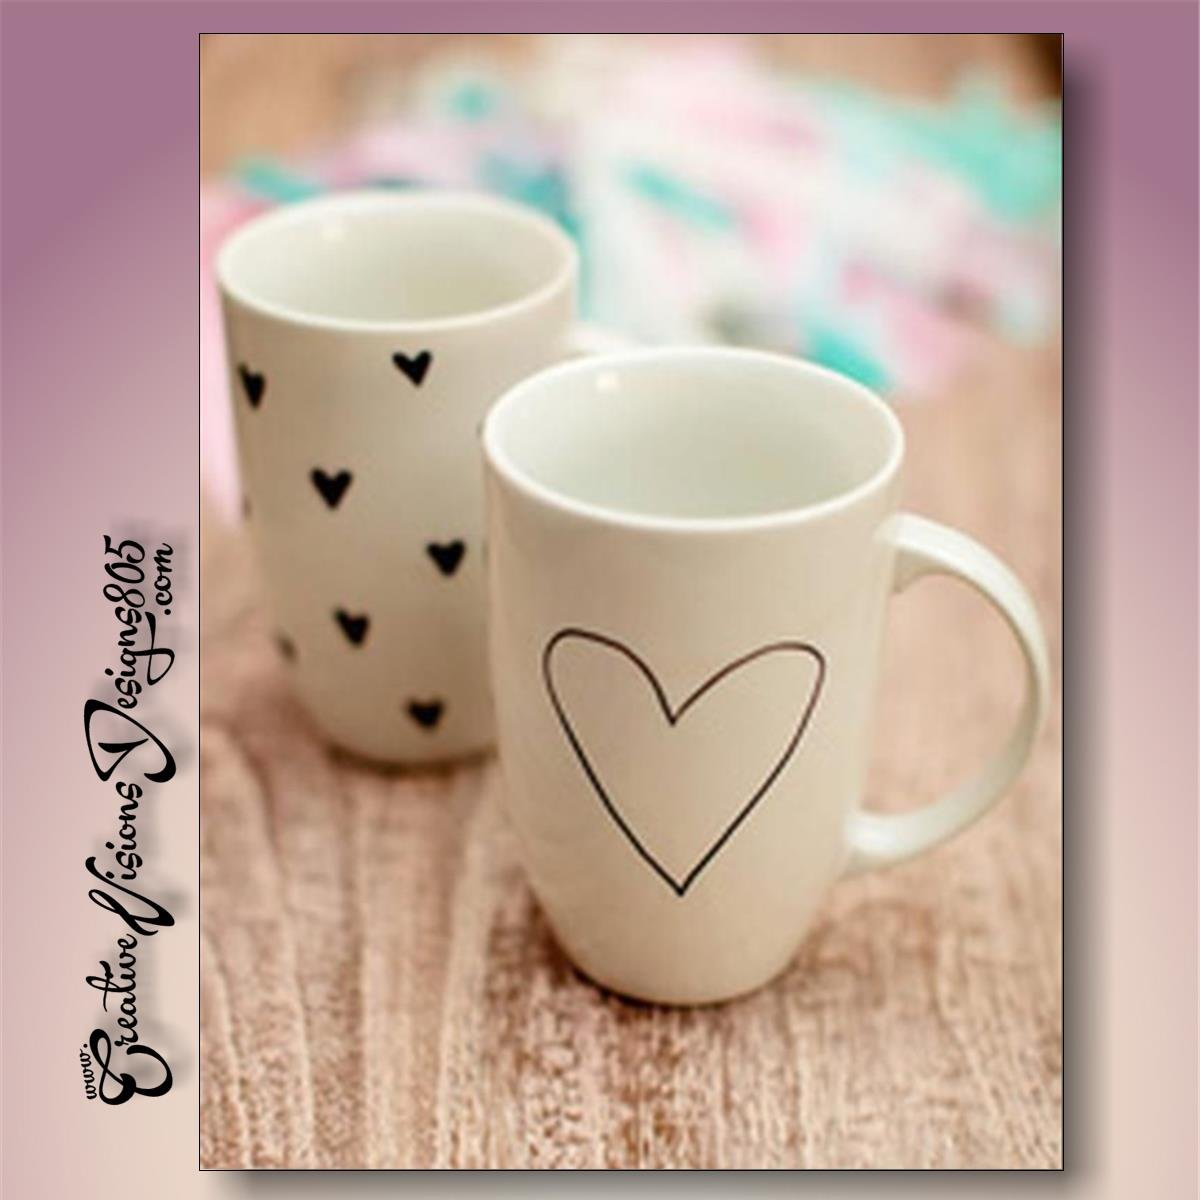 BIG HEART or MINI HEARTS - hand decorated coffee mug